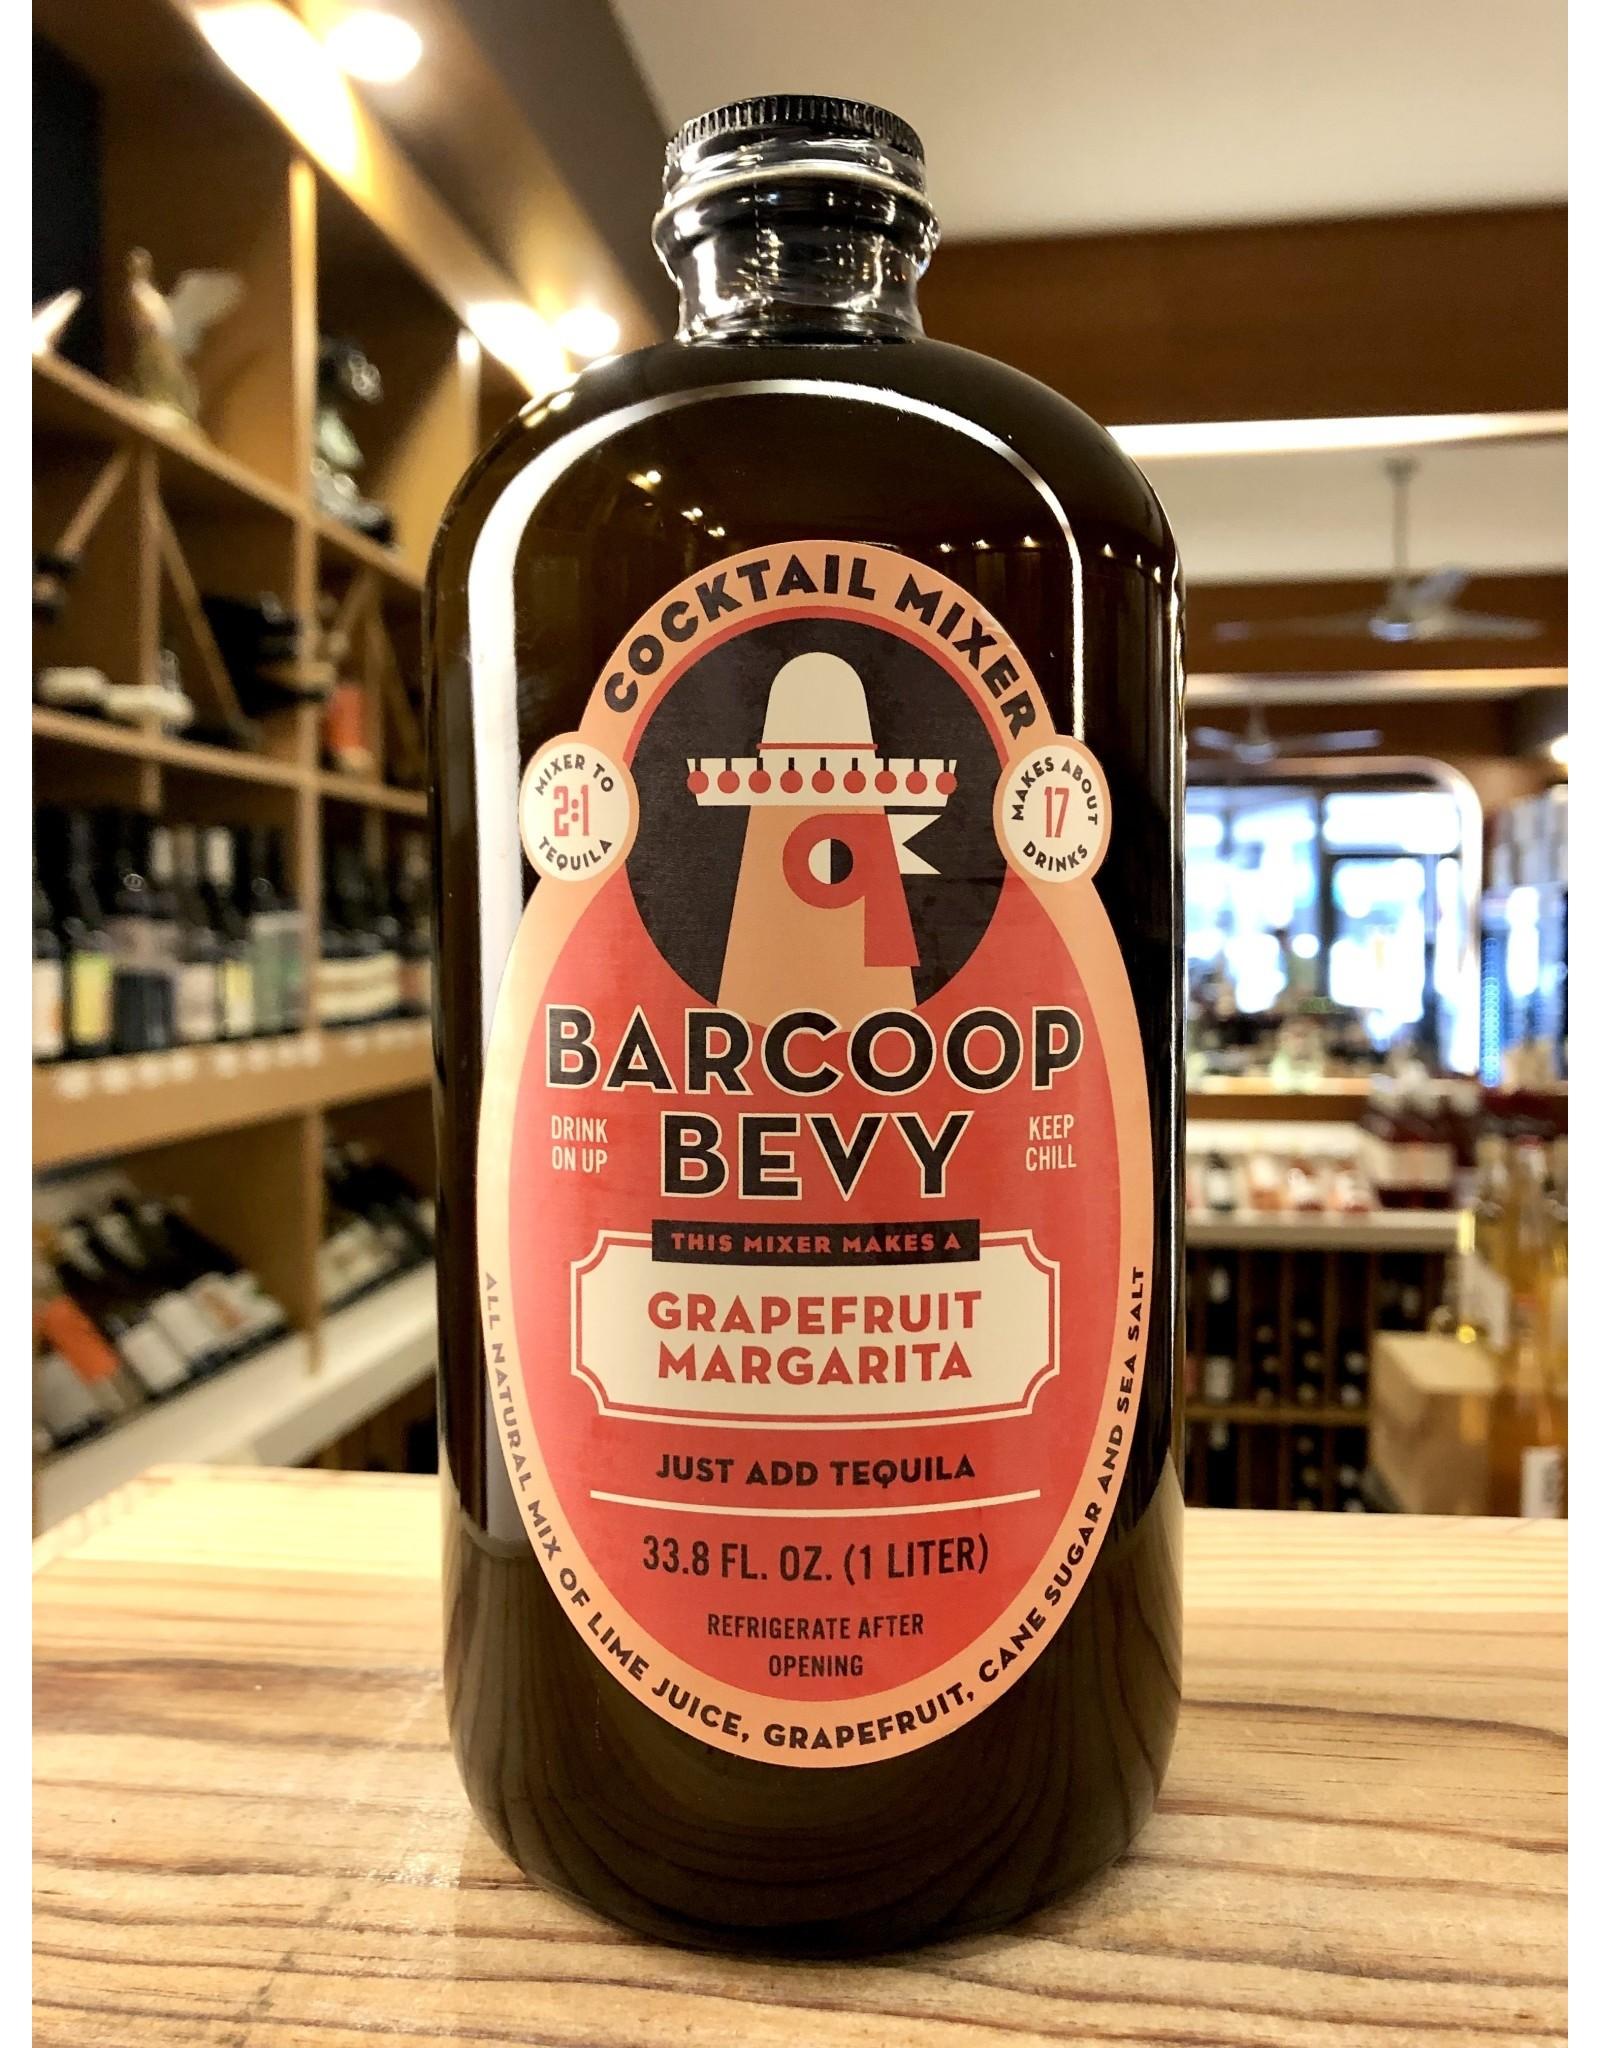 Barcoop Bevy Grapefruit Margarita - 1 Liter